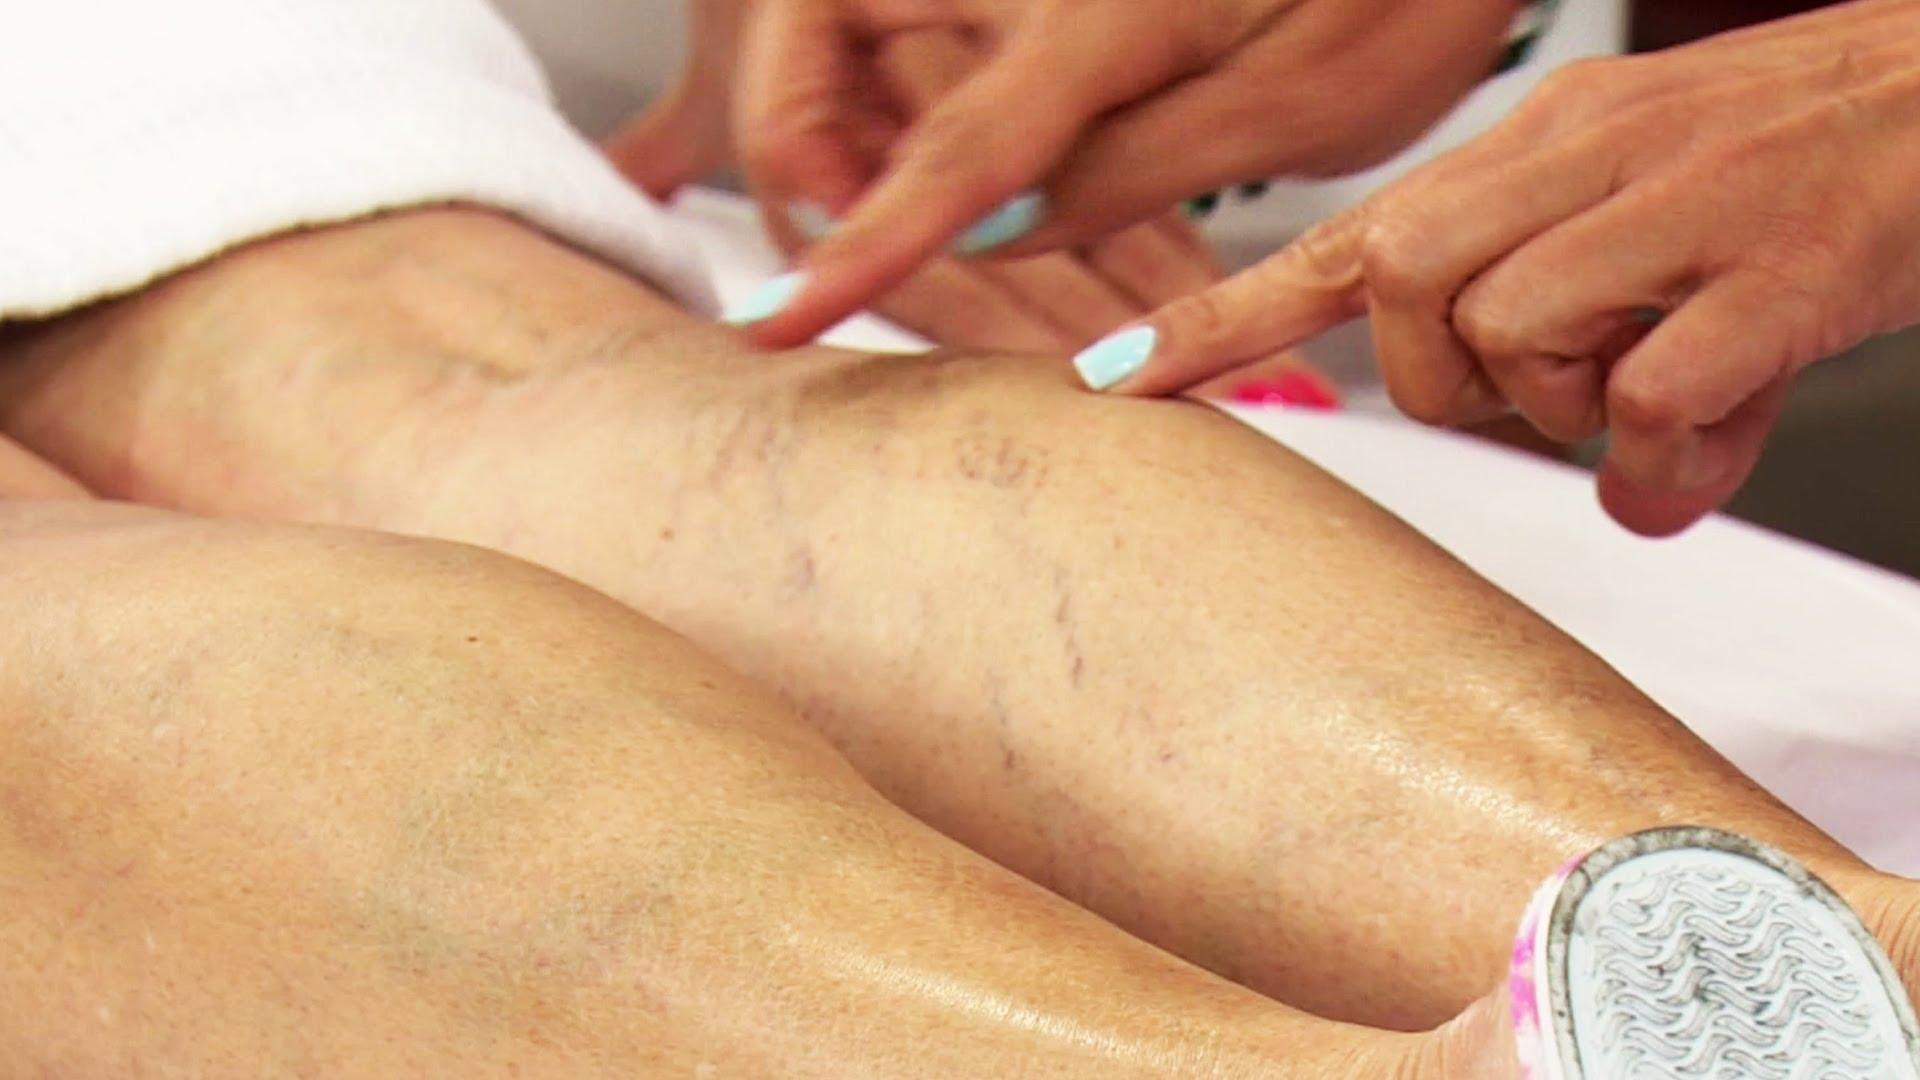 El masaje de las tetonas 7